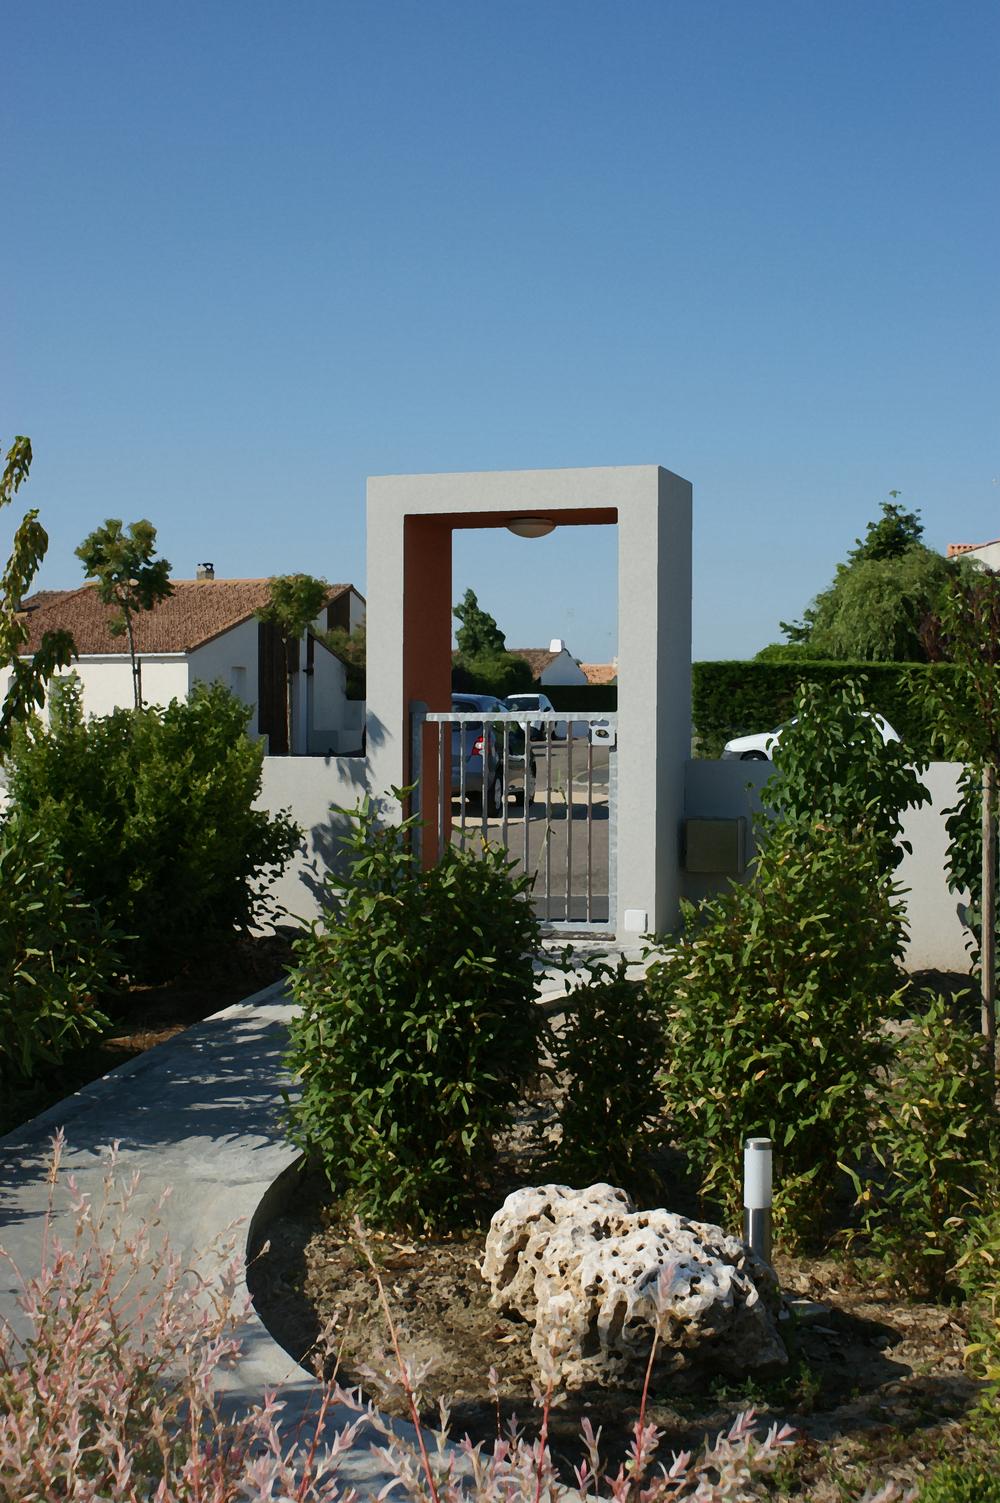 CourtyardHouse-gate.jpg